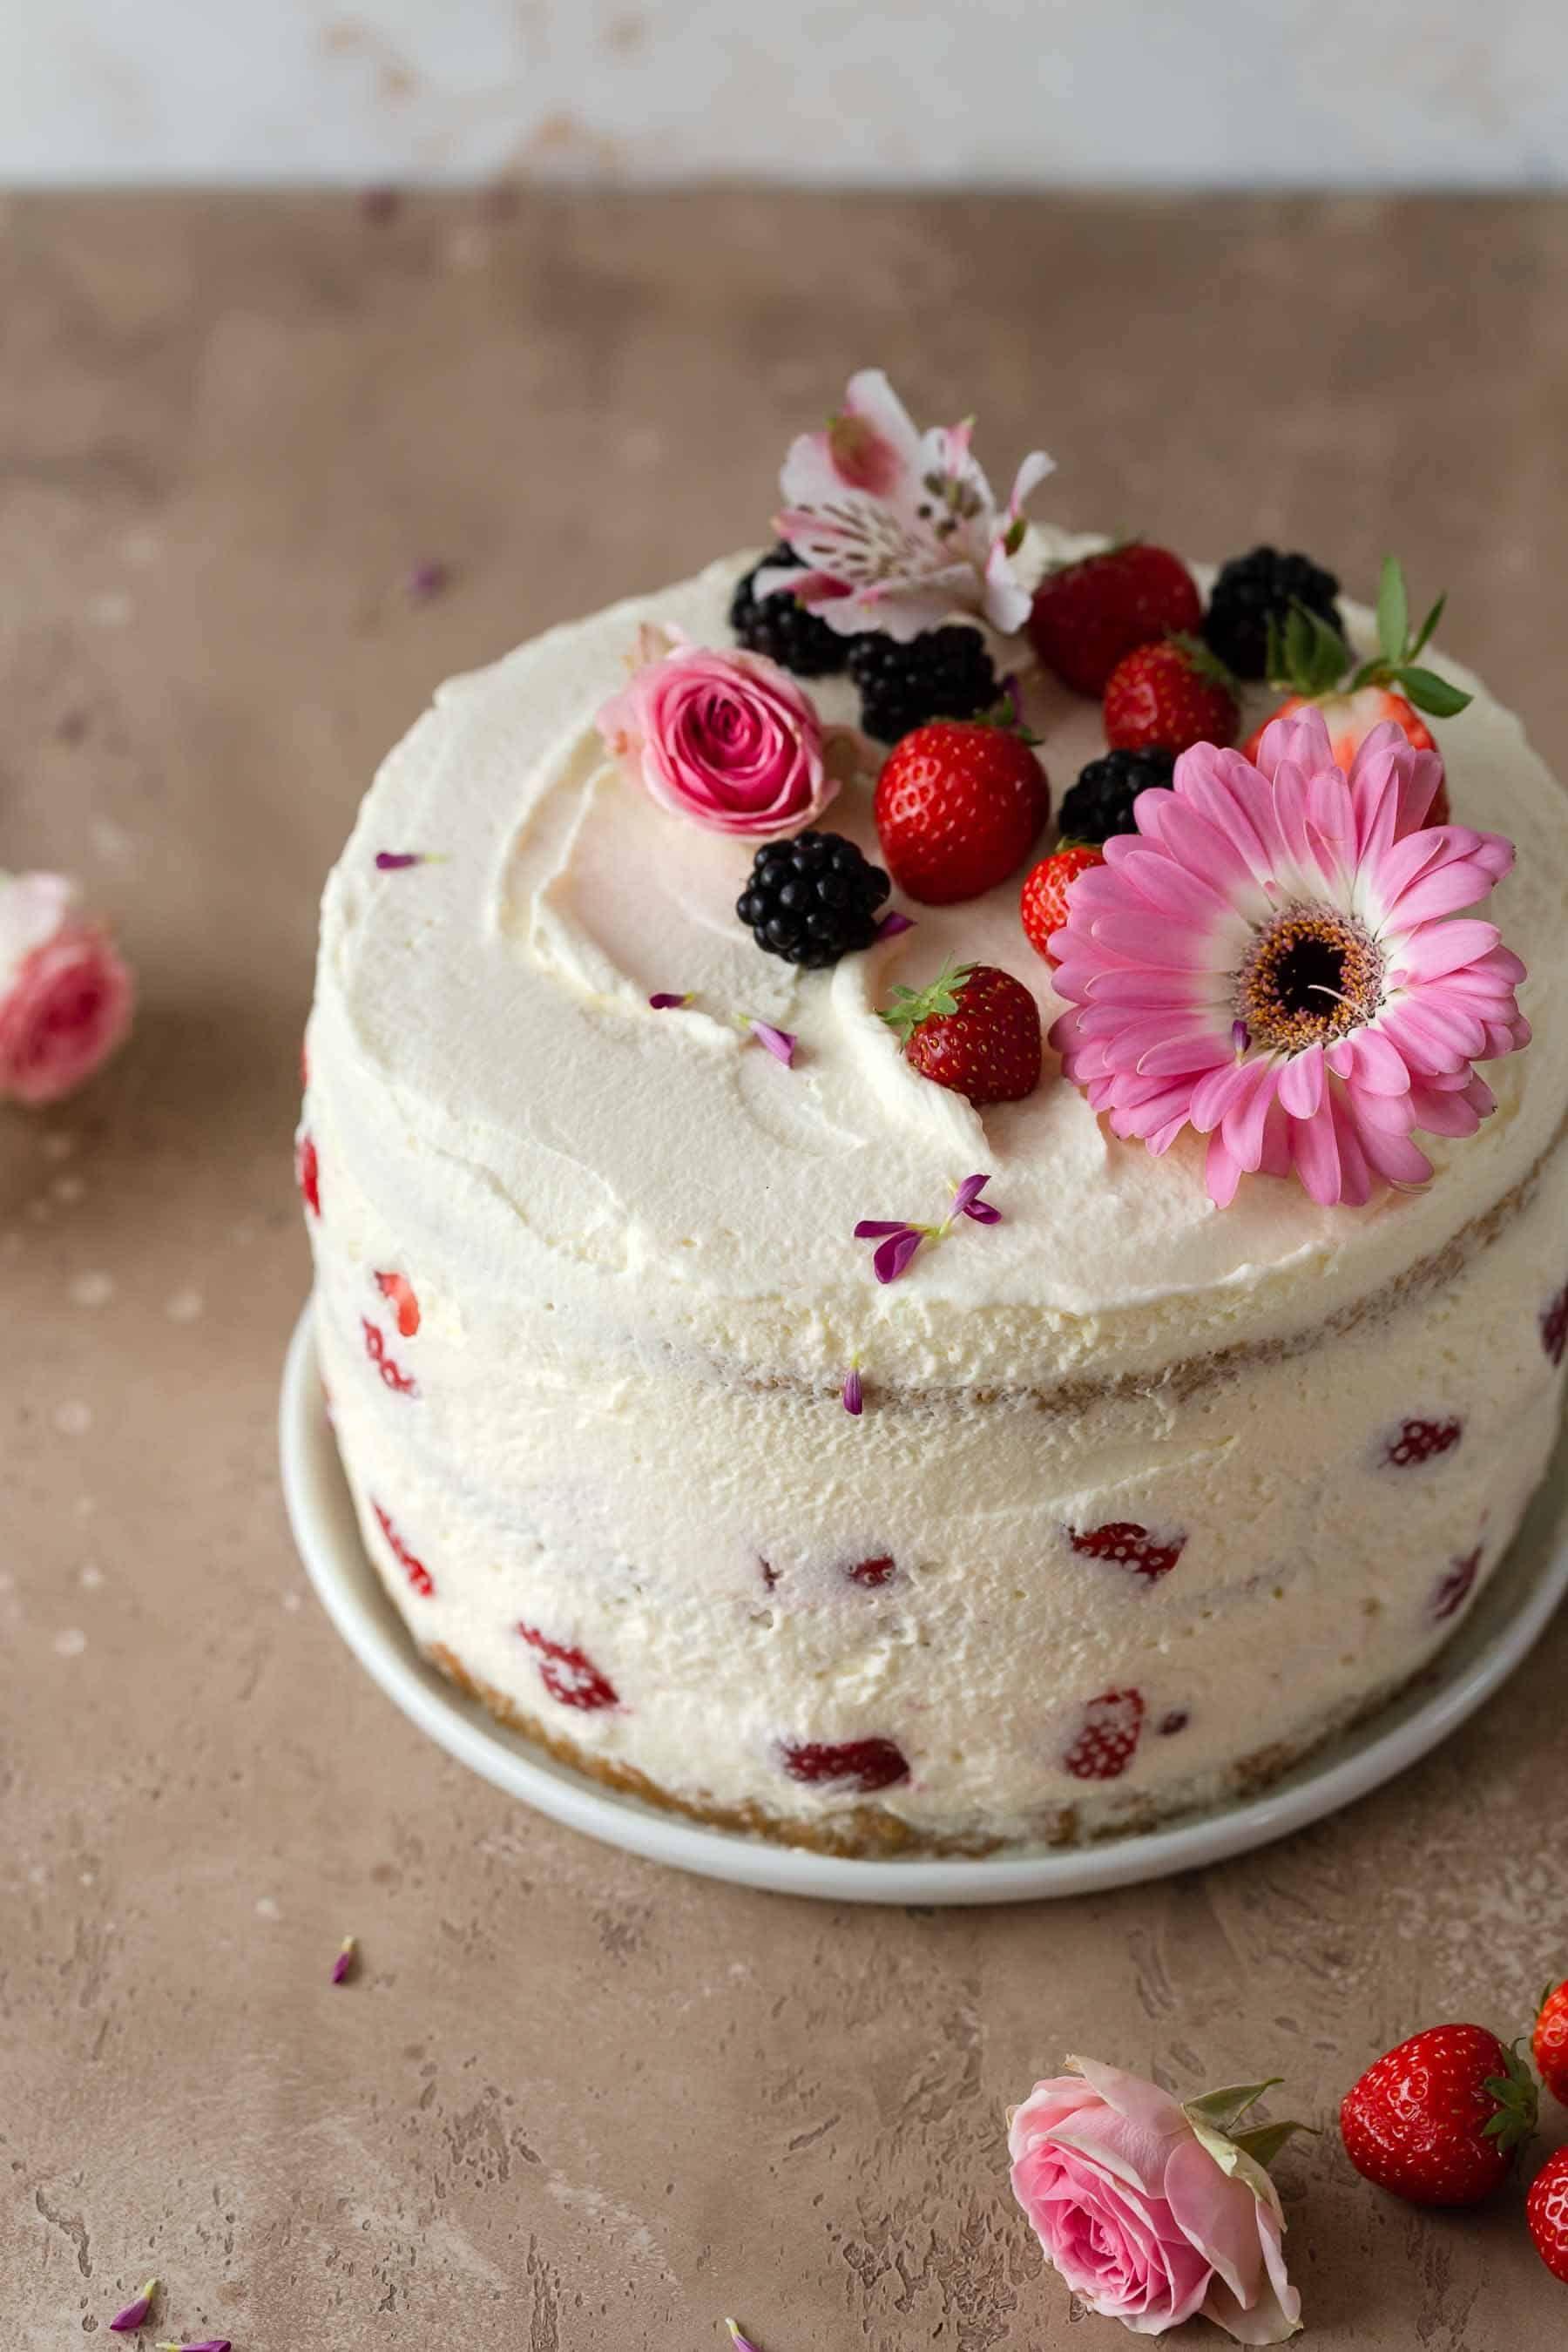 Strawberry Cake Is My Favorite Summer Dessert And So Easy To Make Strawberry Cake Strawberrycake Strawberry Cake Strawberry Layer Cakes Dessert Recipes